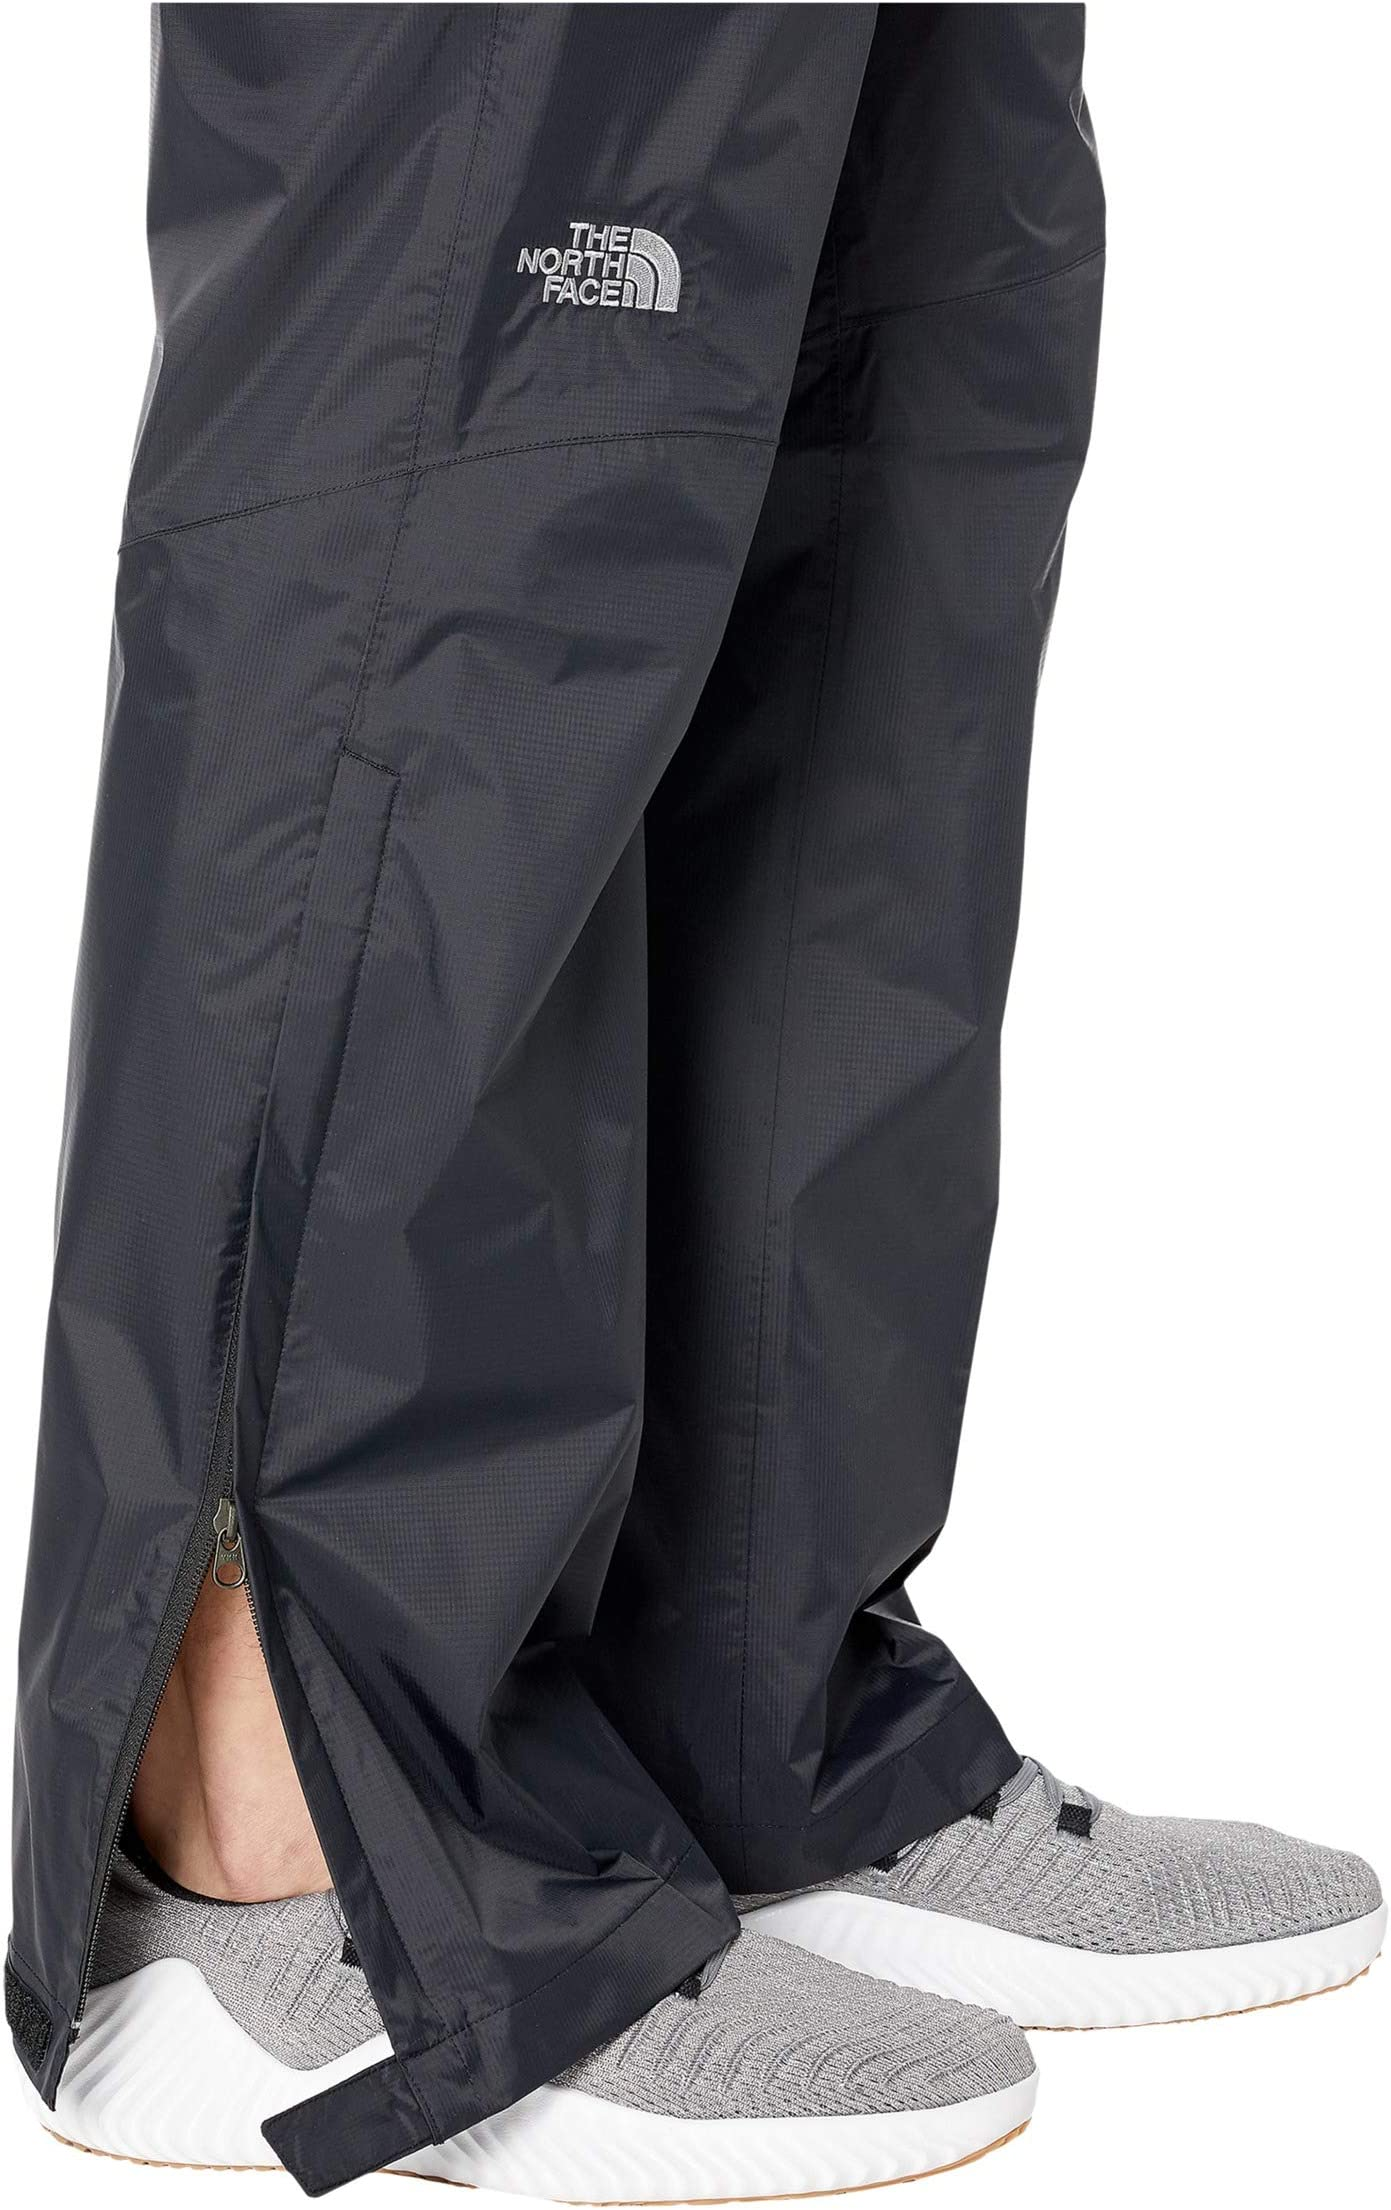 The North Face Venture 2 1/2 Zip Pants U9Leg